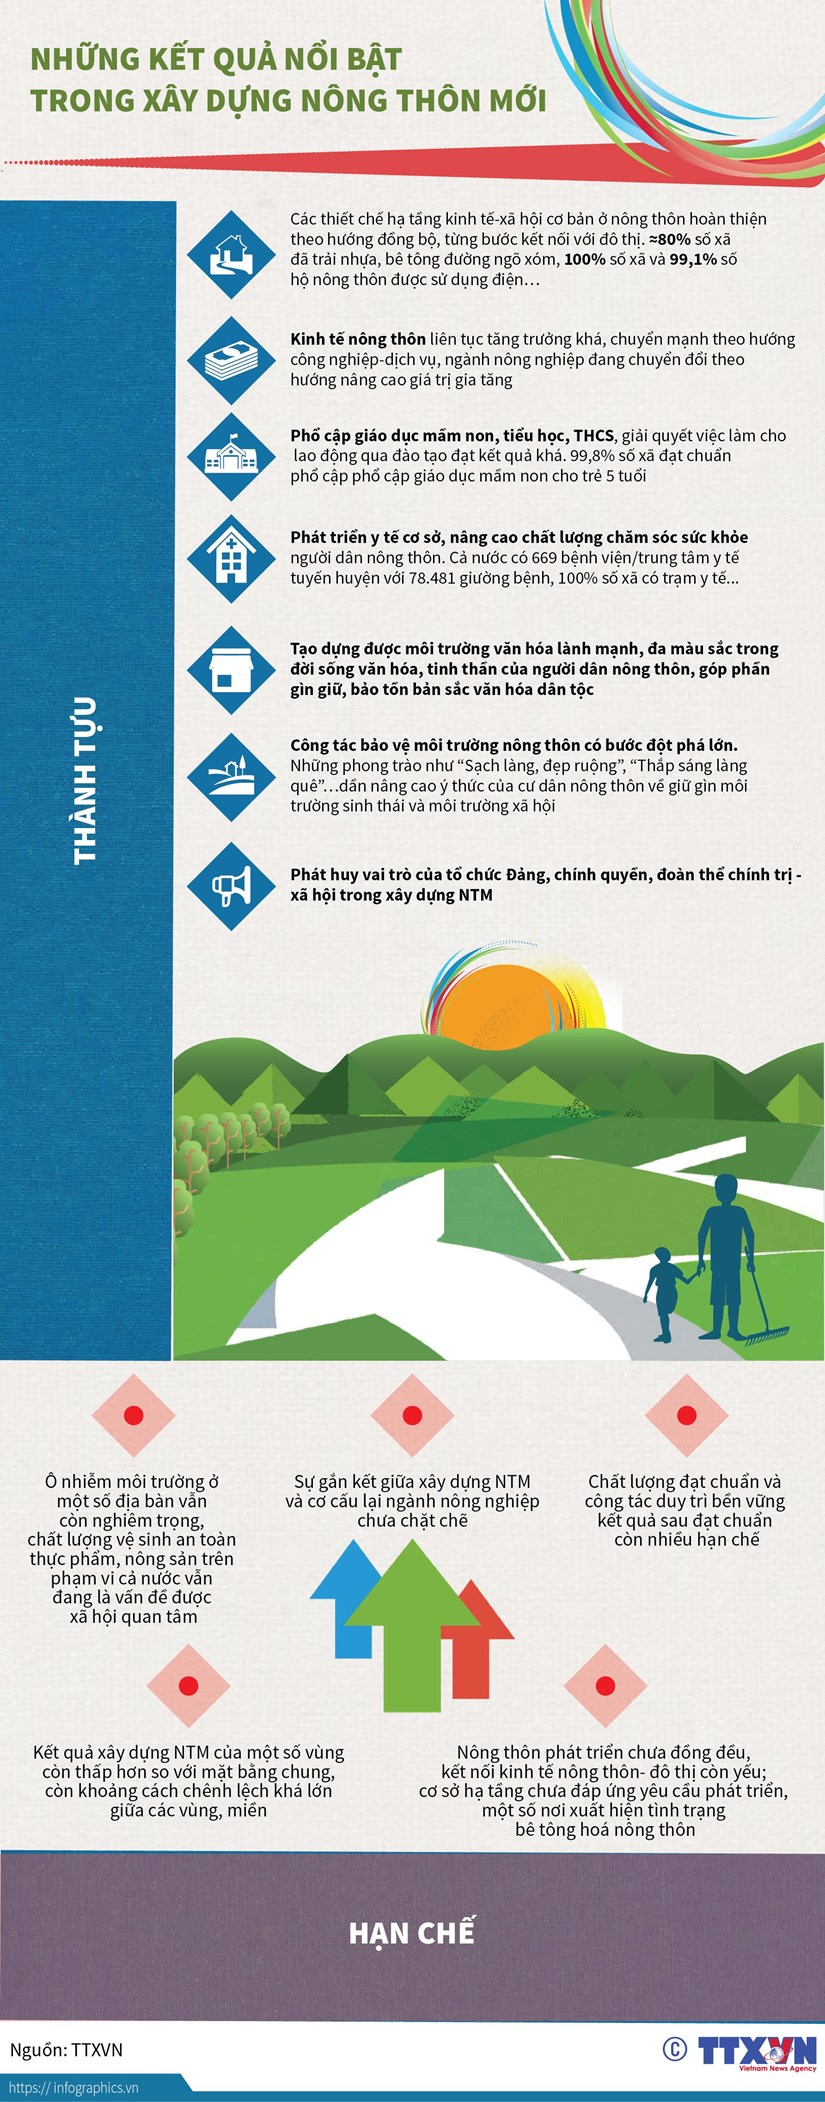 [Infographics] Nhung ket qua noi bat trong xay dung nong thon moi hinh anh 1